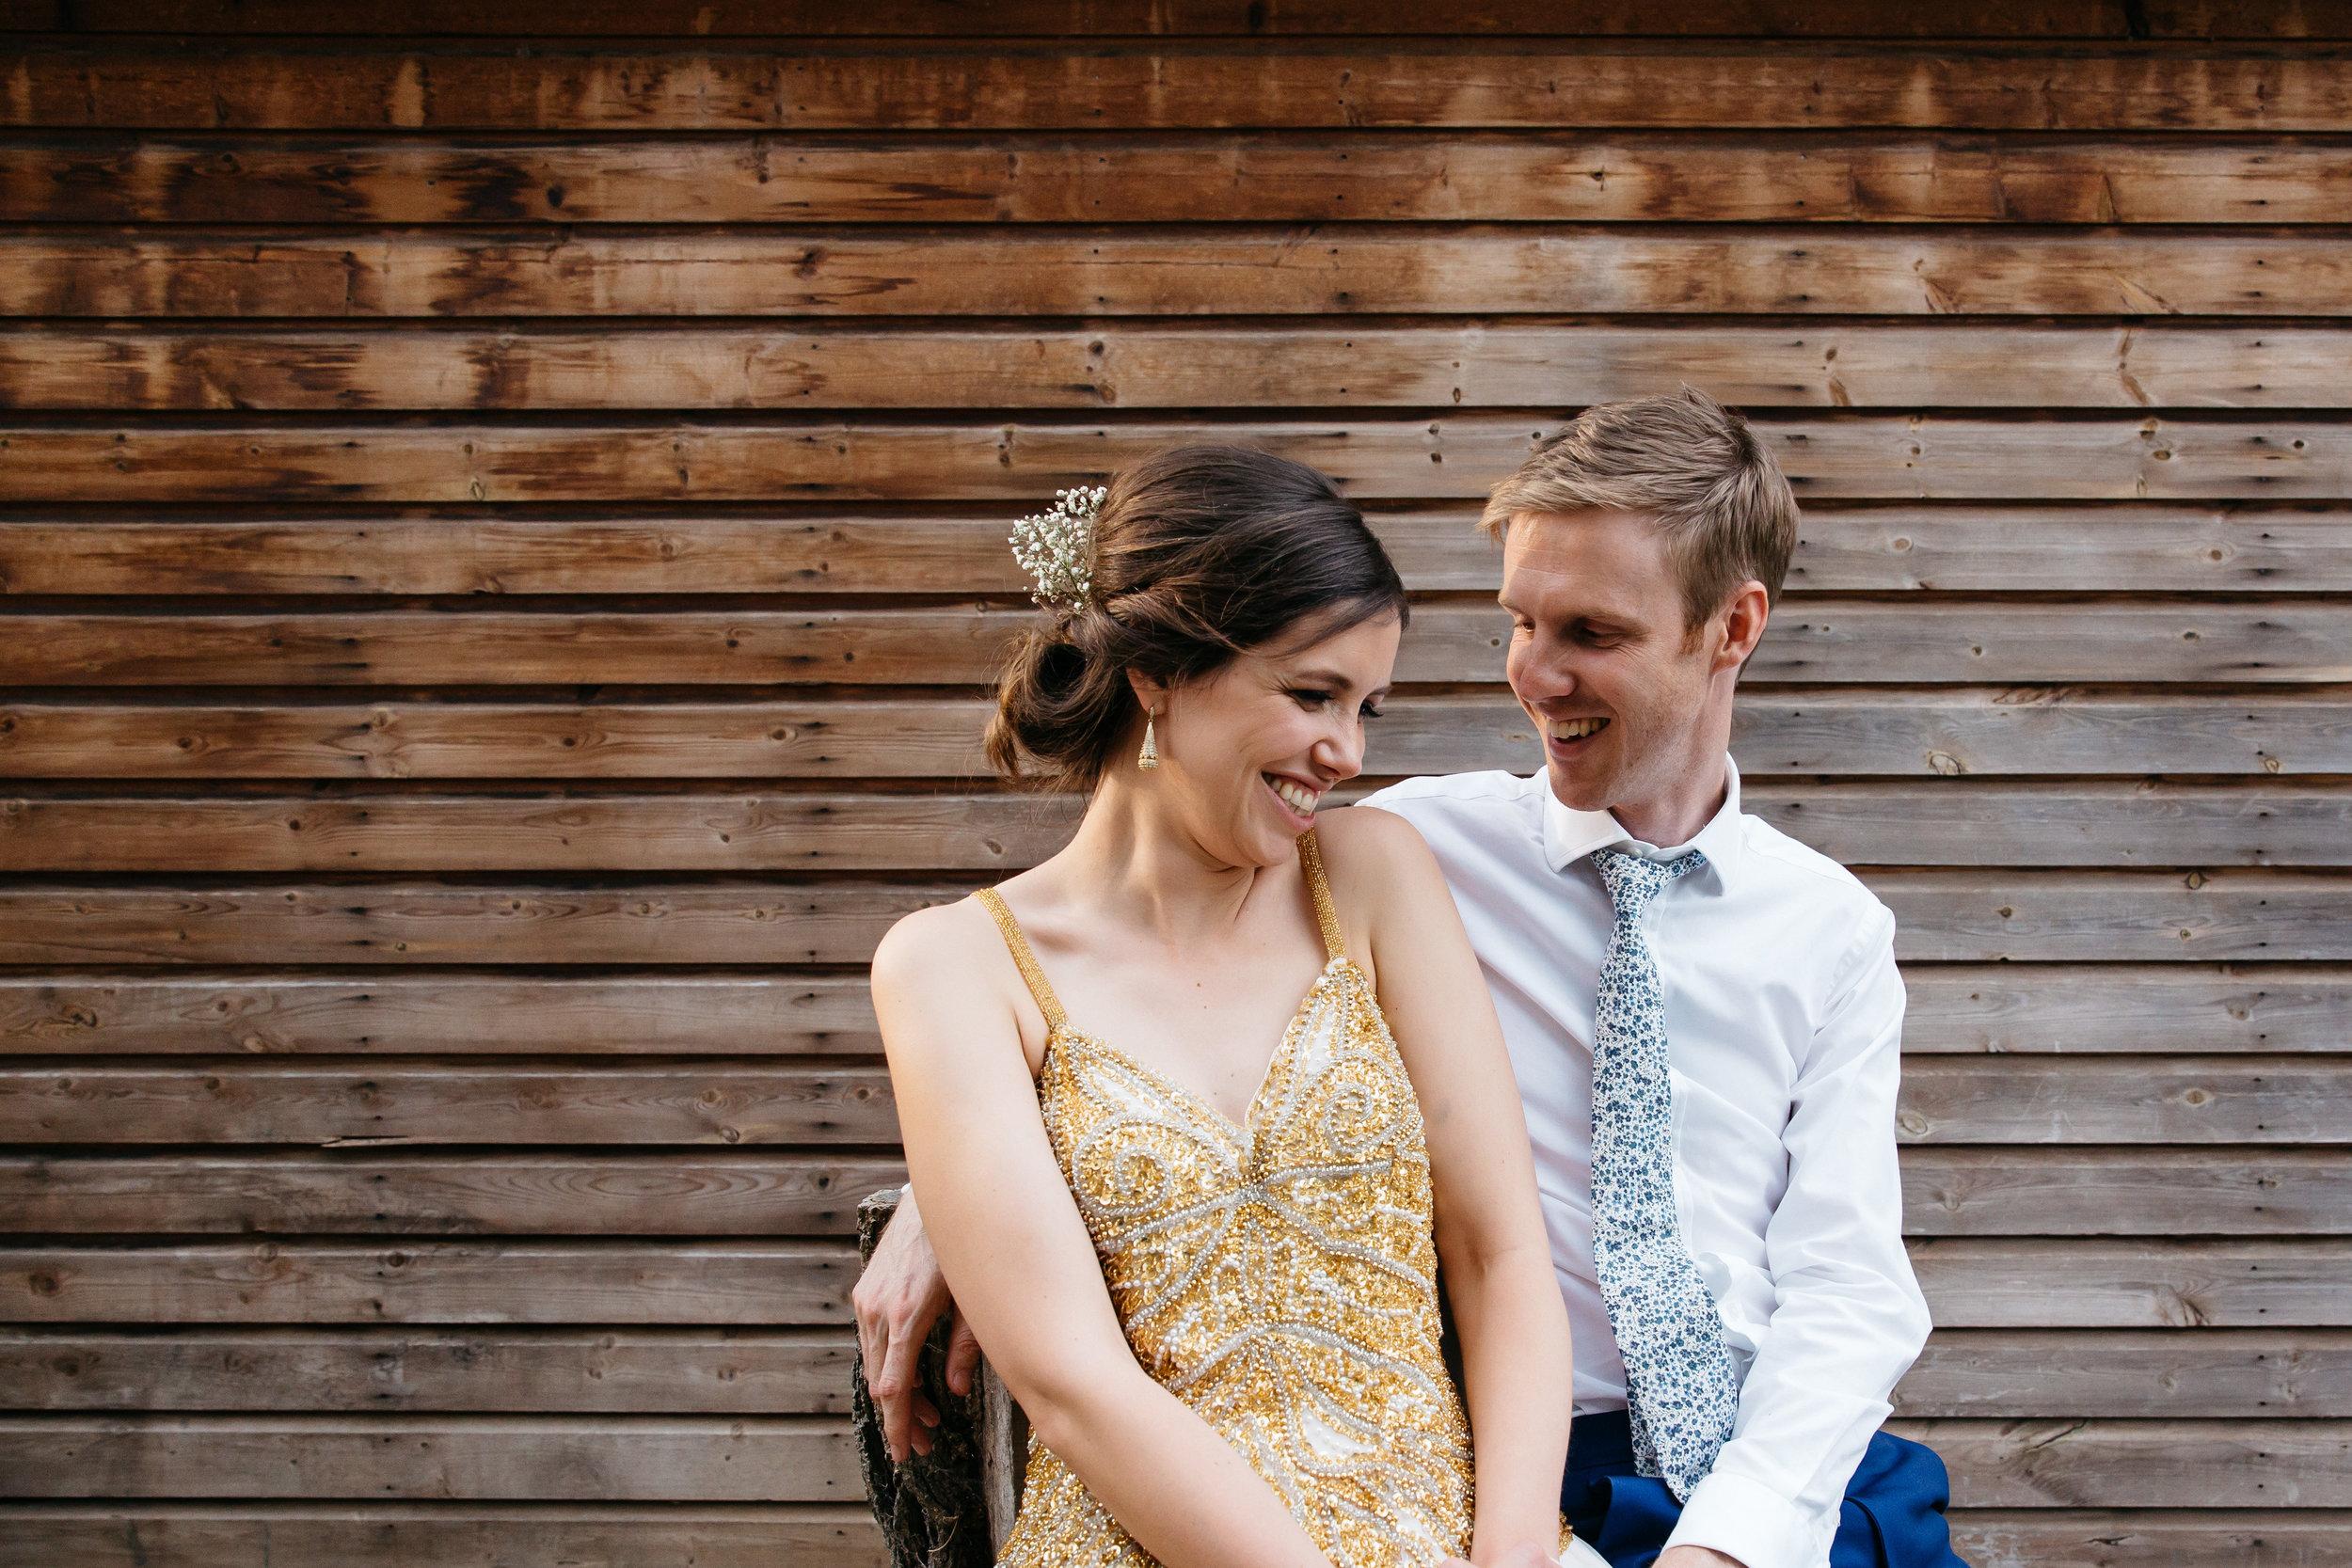 Bride & Groom London Wedding Wooden background